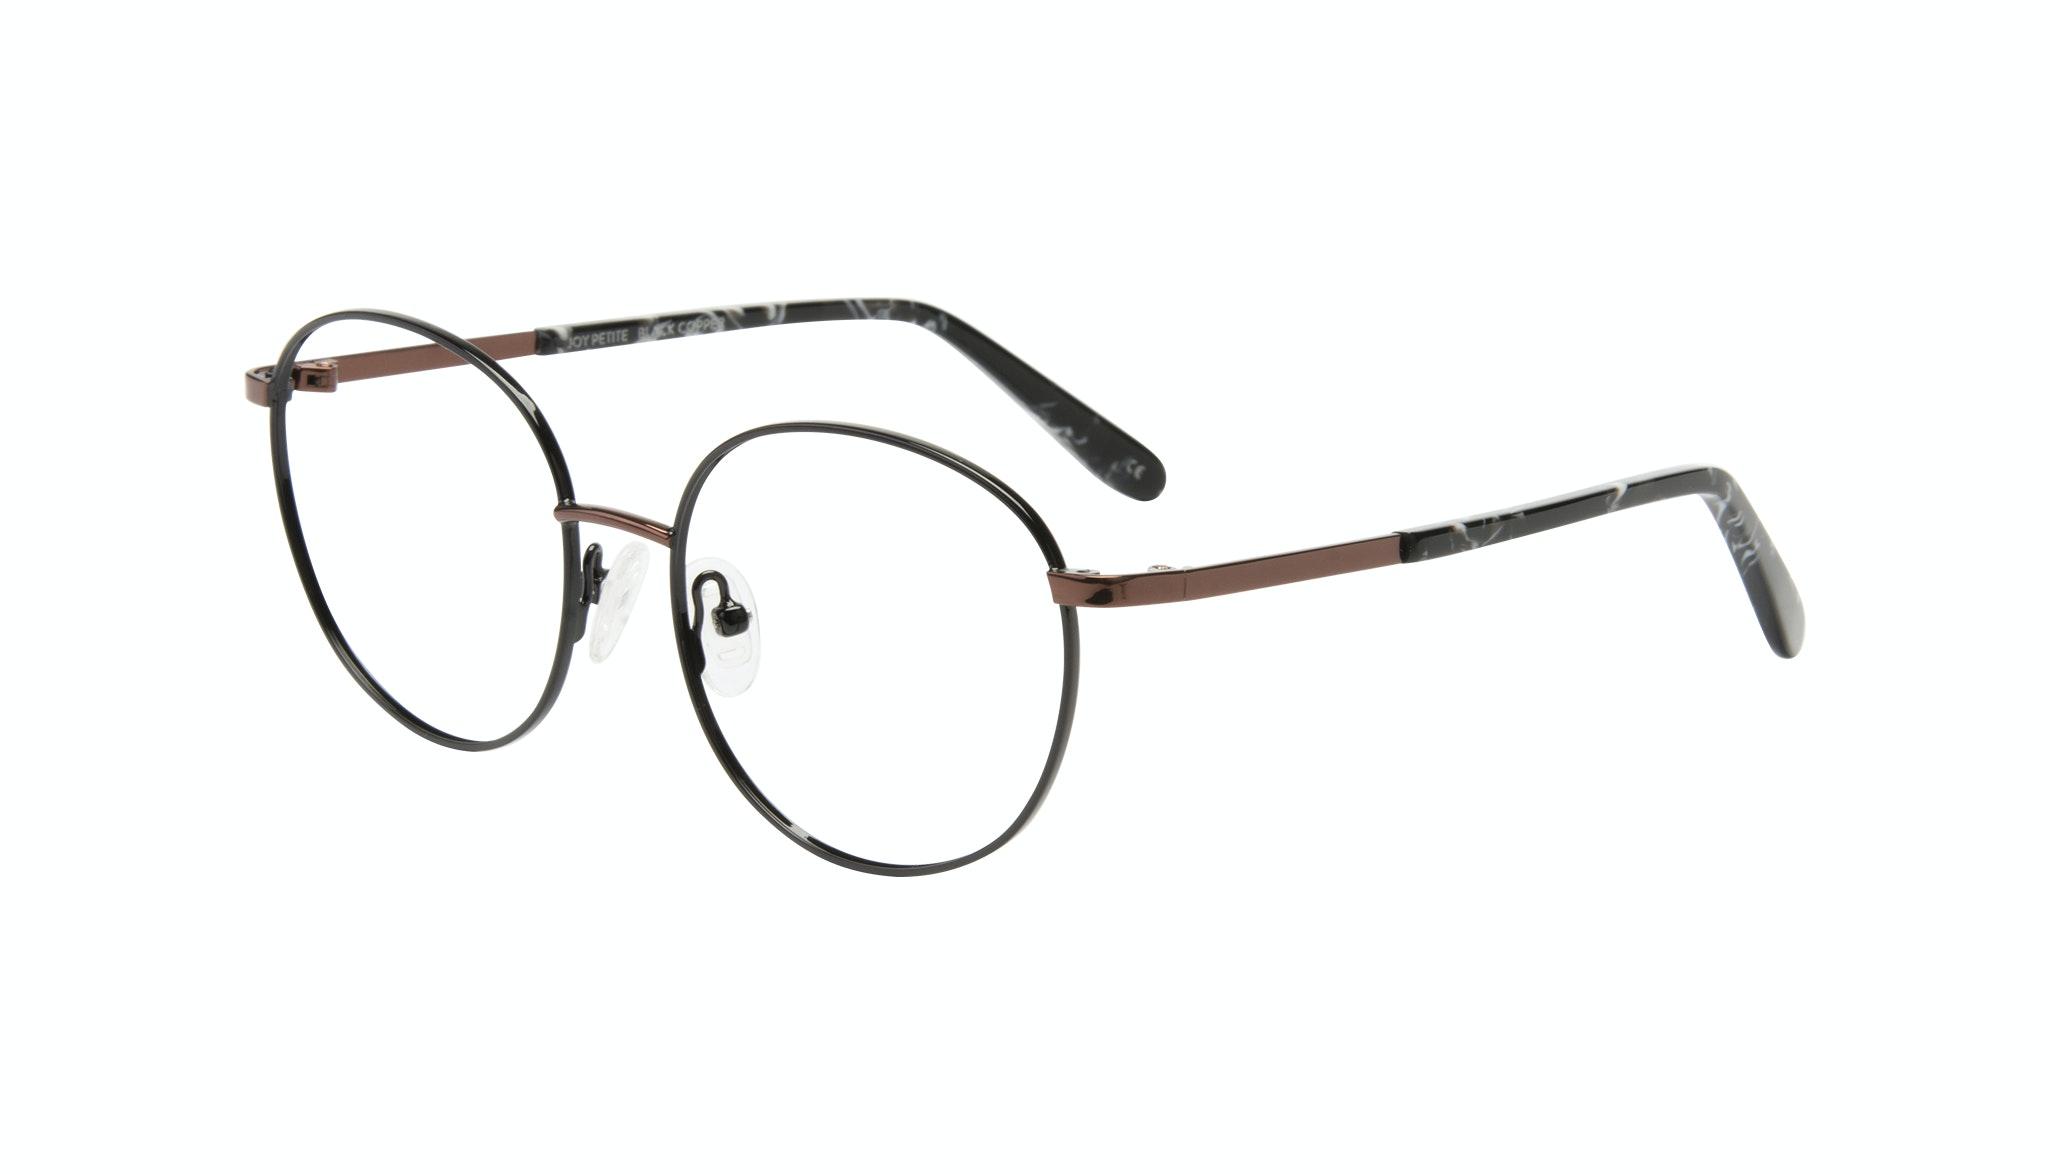 Affordable Fashion Glasses Round Eyeglasses Women Joy Petite Black Copper Tilt